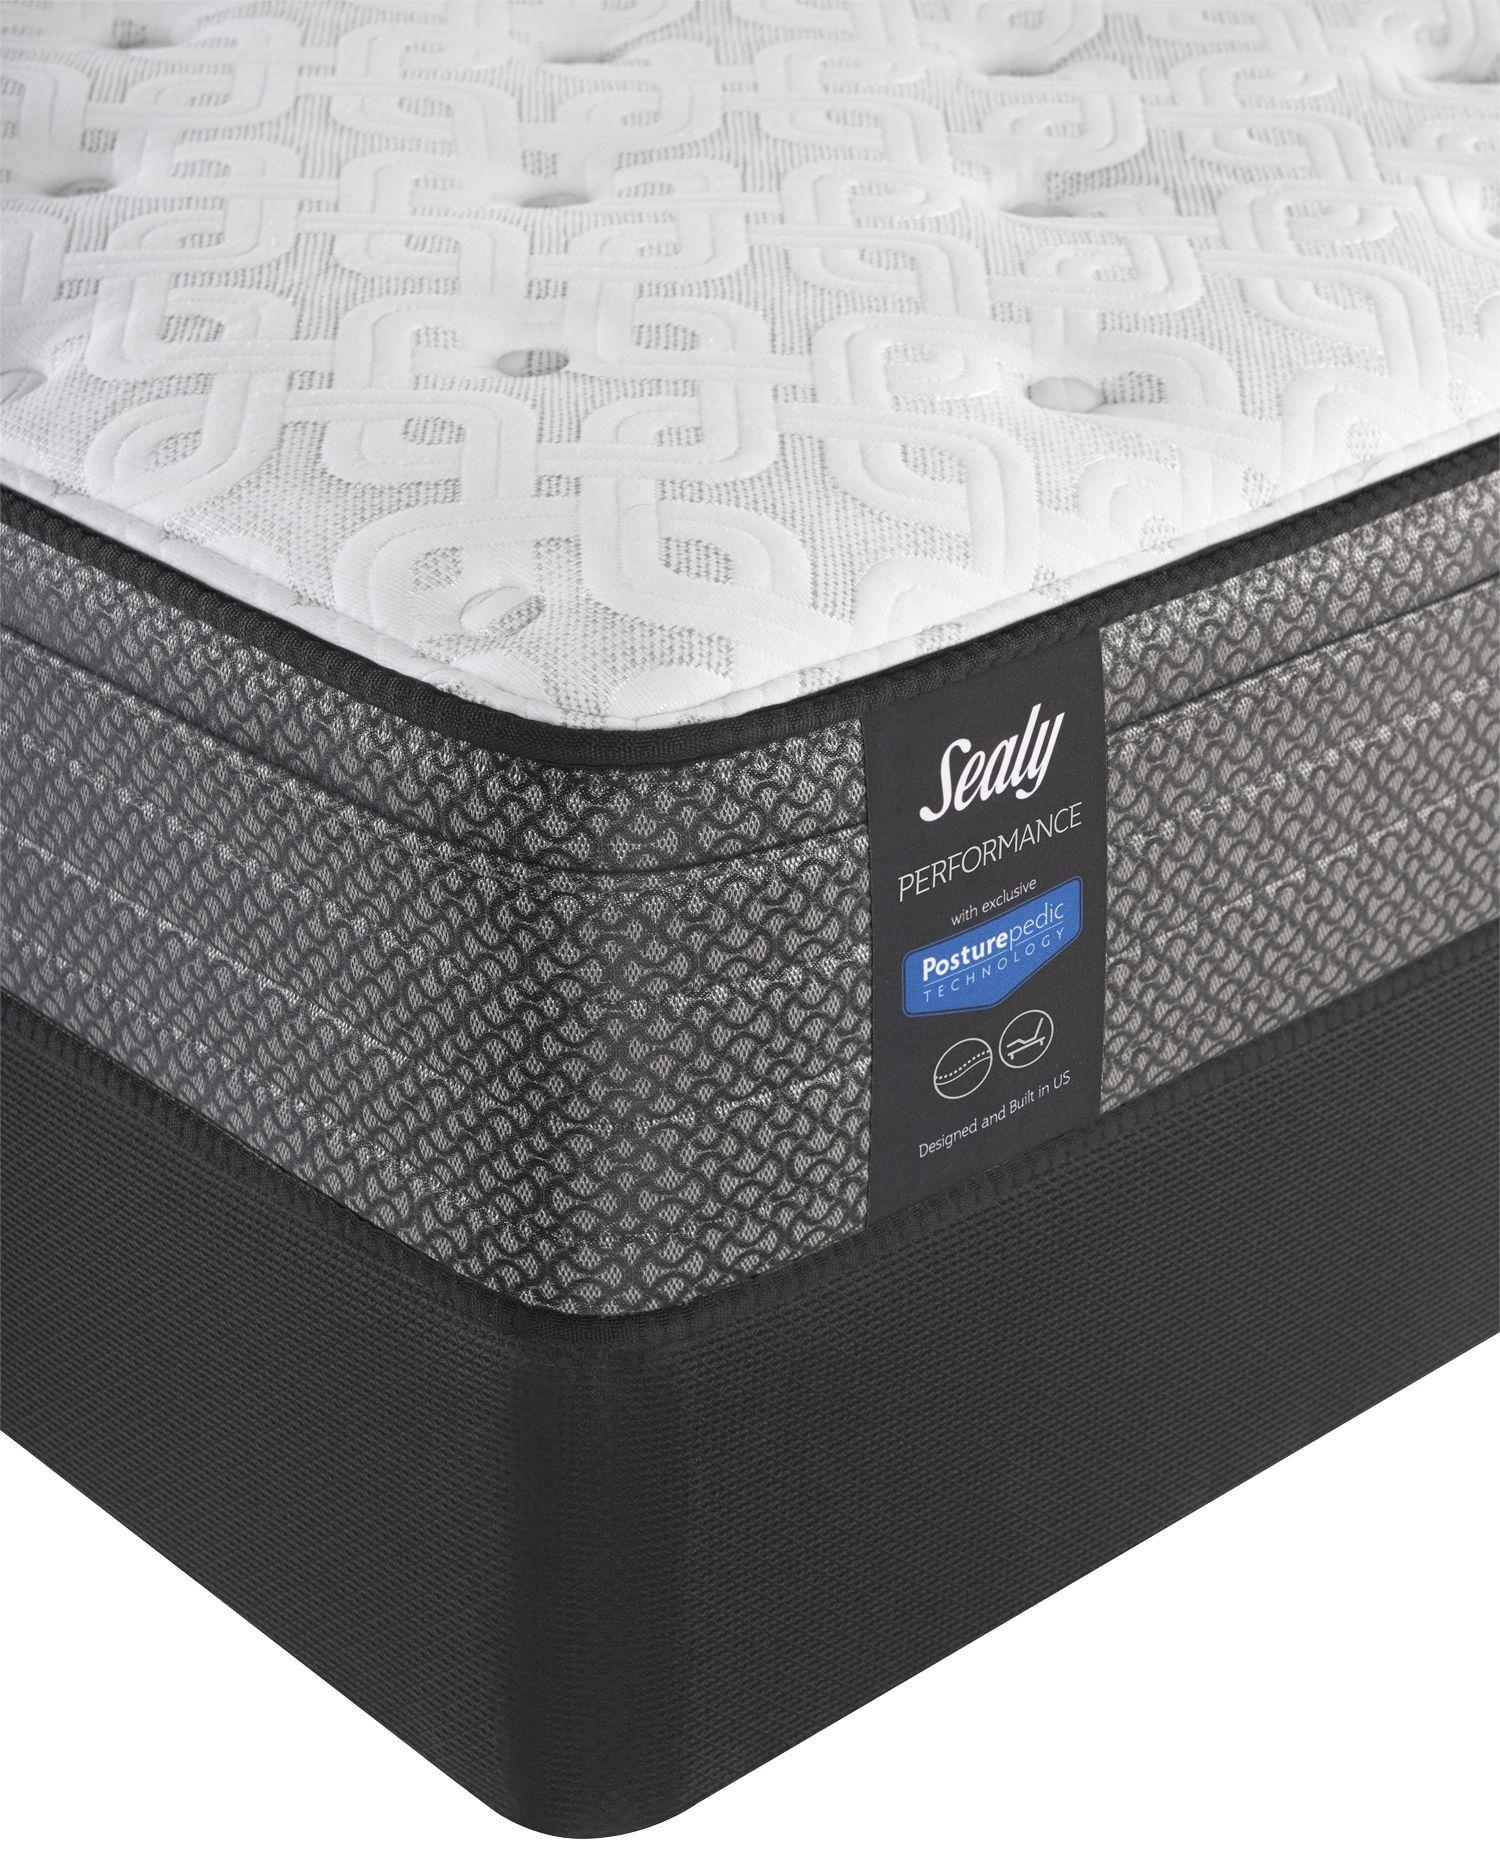 Sealy Posturepedic Hybrid Cobalt Firm Full Mattress